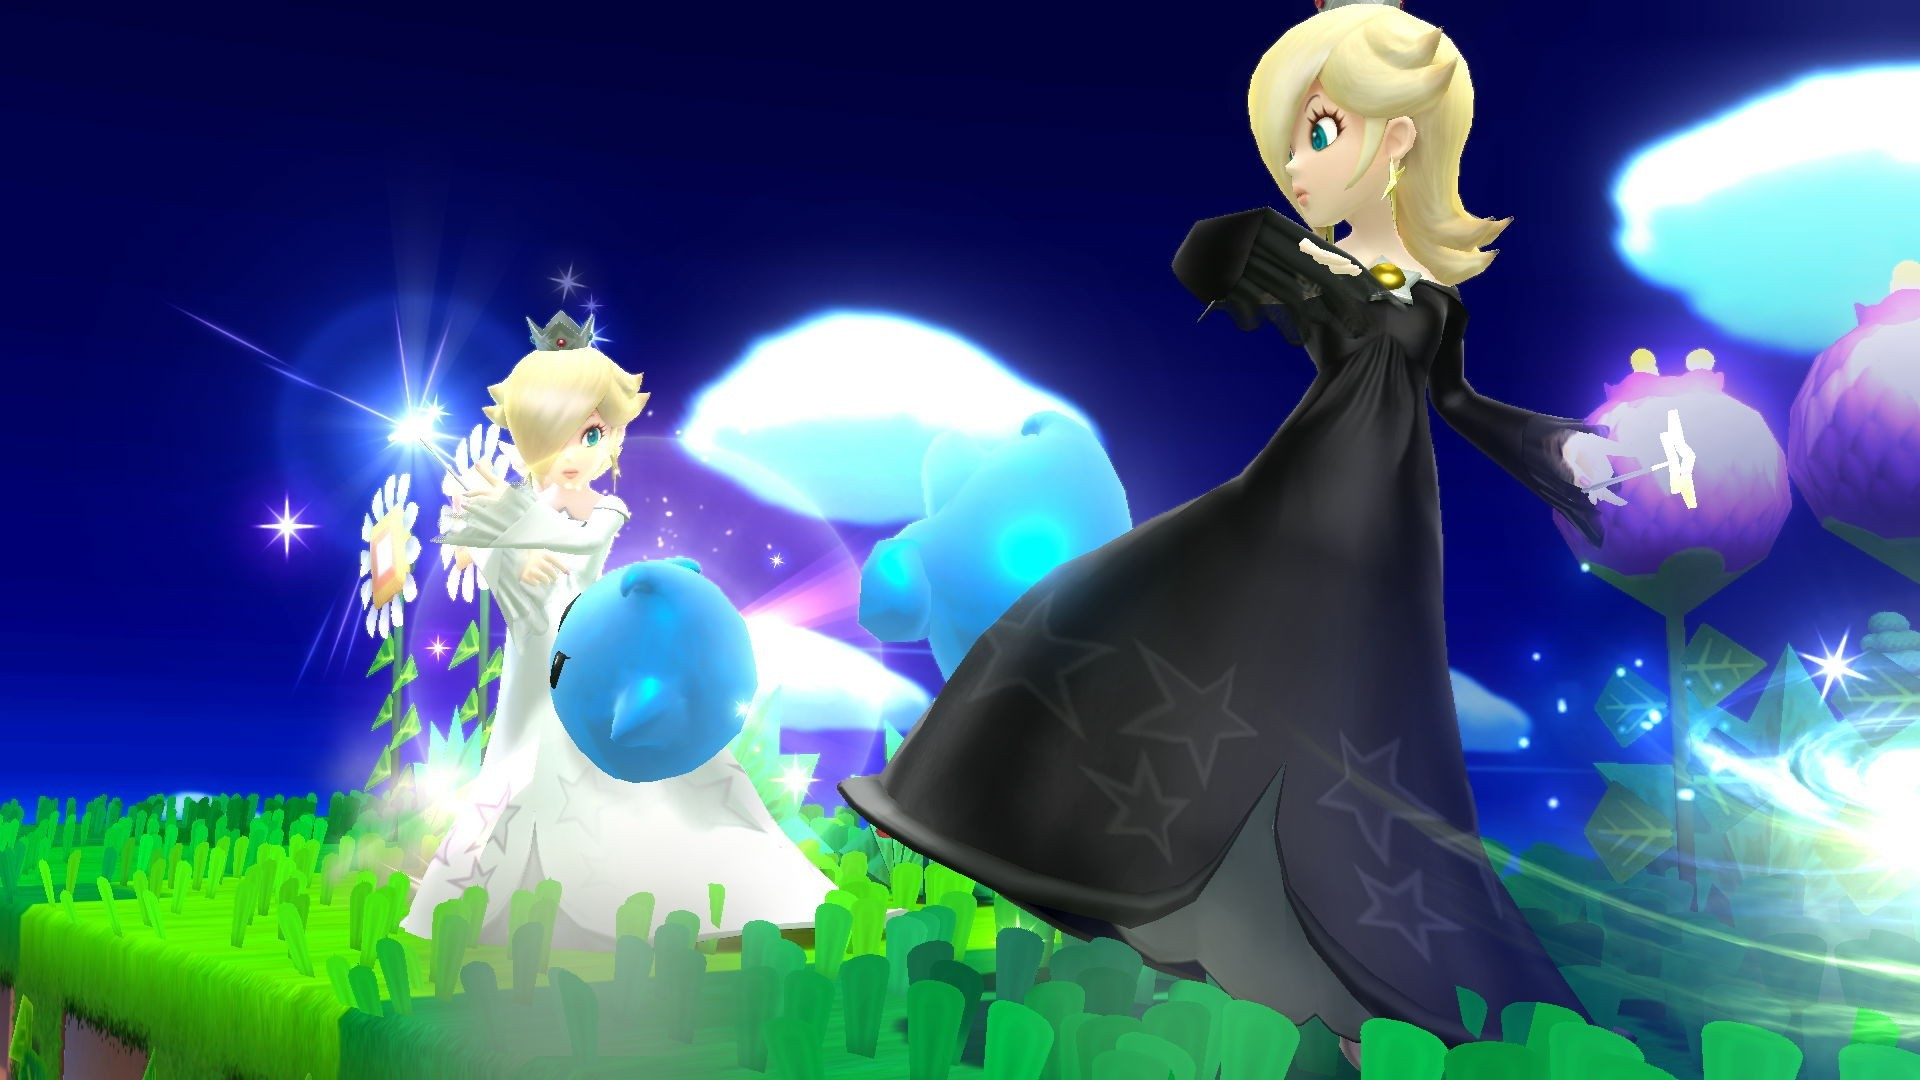 Monochrome Rosalina A Rosalina and Luma Super Smash Bros. for Wii U (SSBU)  Skin Mod submitted by amphetavin